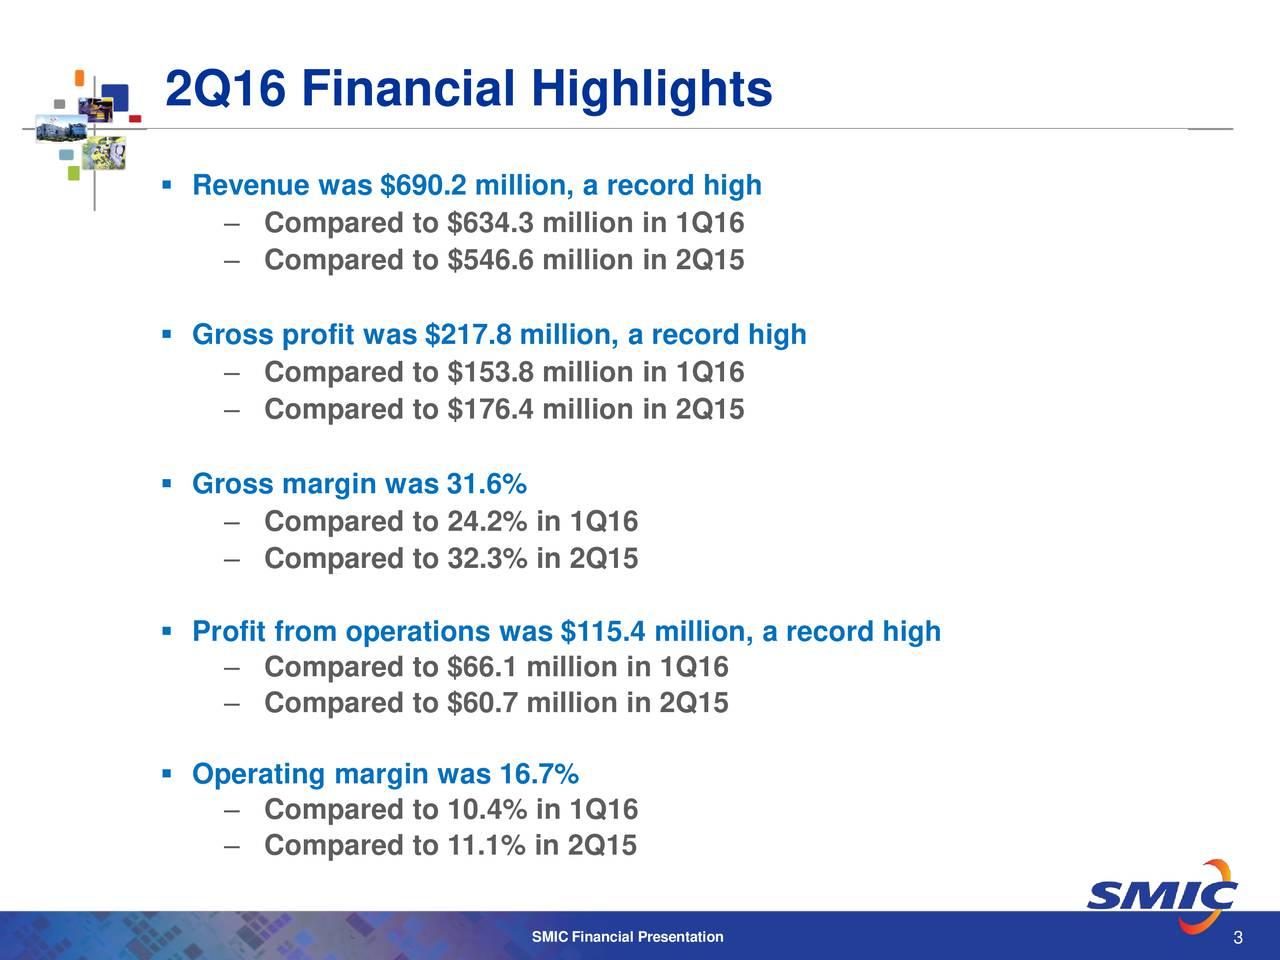 Revenue was $690.2 million, a record high Compared to $634.3 million in 1Q16 Compared to $546.6 million in 2Q15 Gross profit was $217.8 million, a record high Compared to $153.8 million in 1Q16 Compared to $176.4 million in 2Q15 Gross margin was 31.6% Compared to 24.2% in 1Q16 Compared to 32.3% in 2Q15 Profit from operations was $115.4 million, a record high Compared to $66.1 million in 1Q16 Compared to $60.7 million in 2Q15 Operating margin was 16.7% Compared to 10.4% in 1Q16 Compared to 11.1% in 2Q15 SMIC Financial Presentation 3